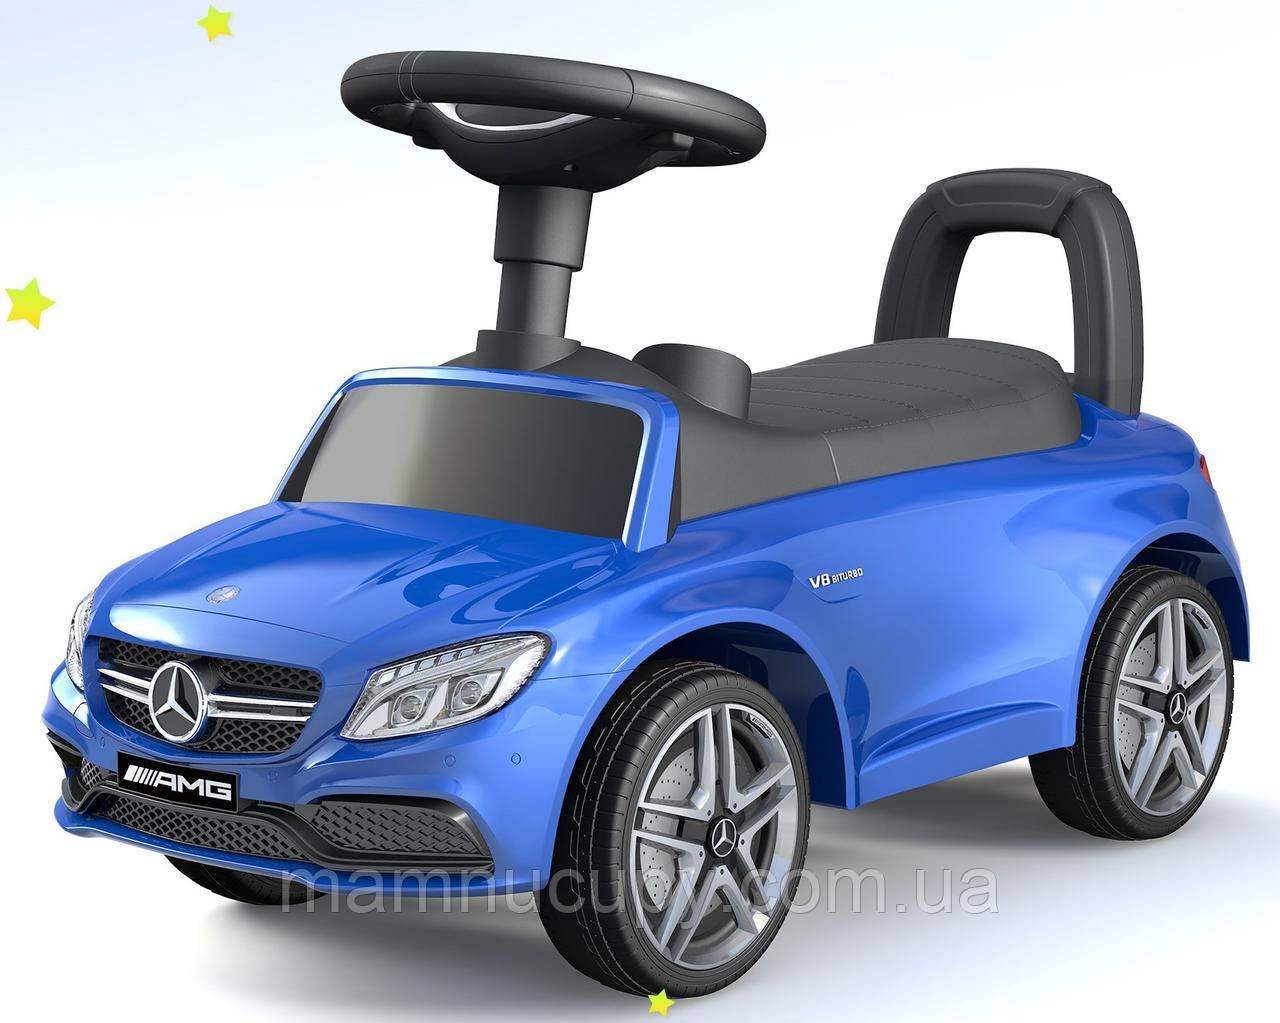 Машинка толокар Baby Mix UR-HZ638 Mercedes AMG C63 Blue